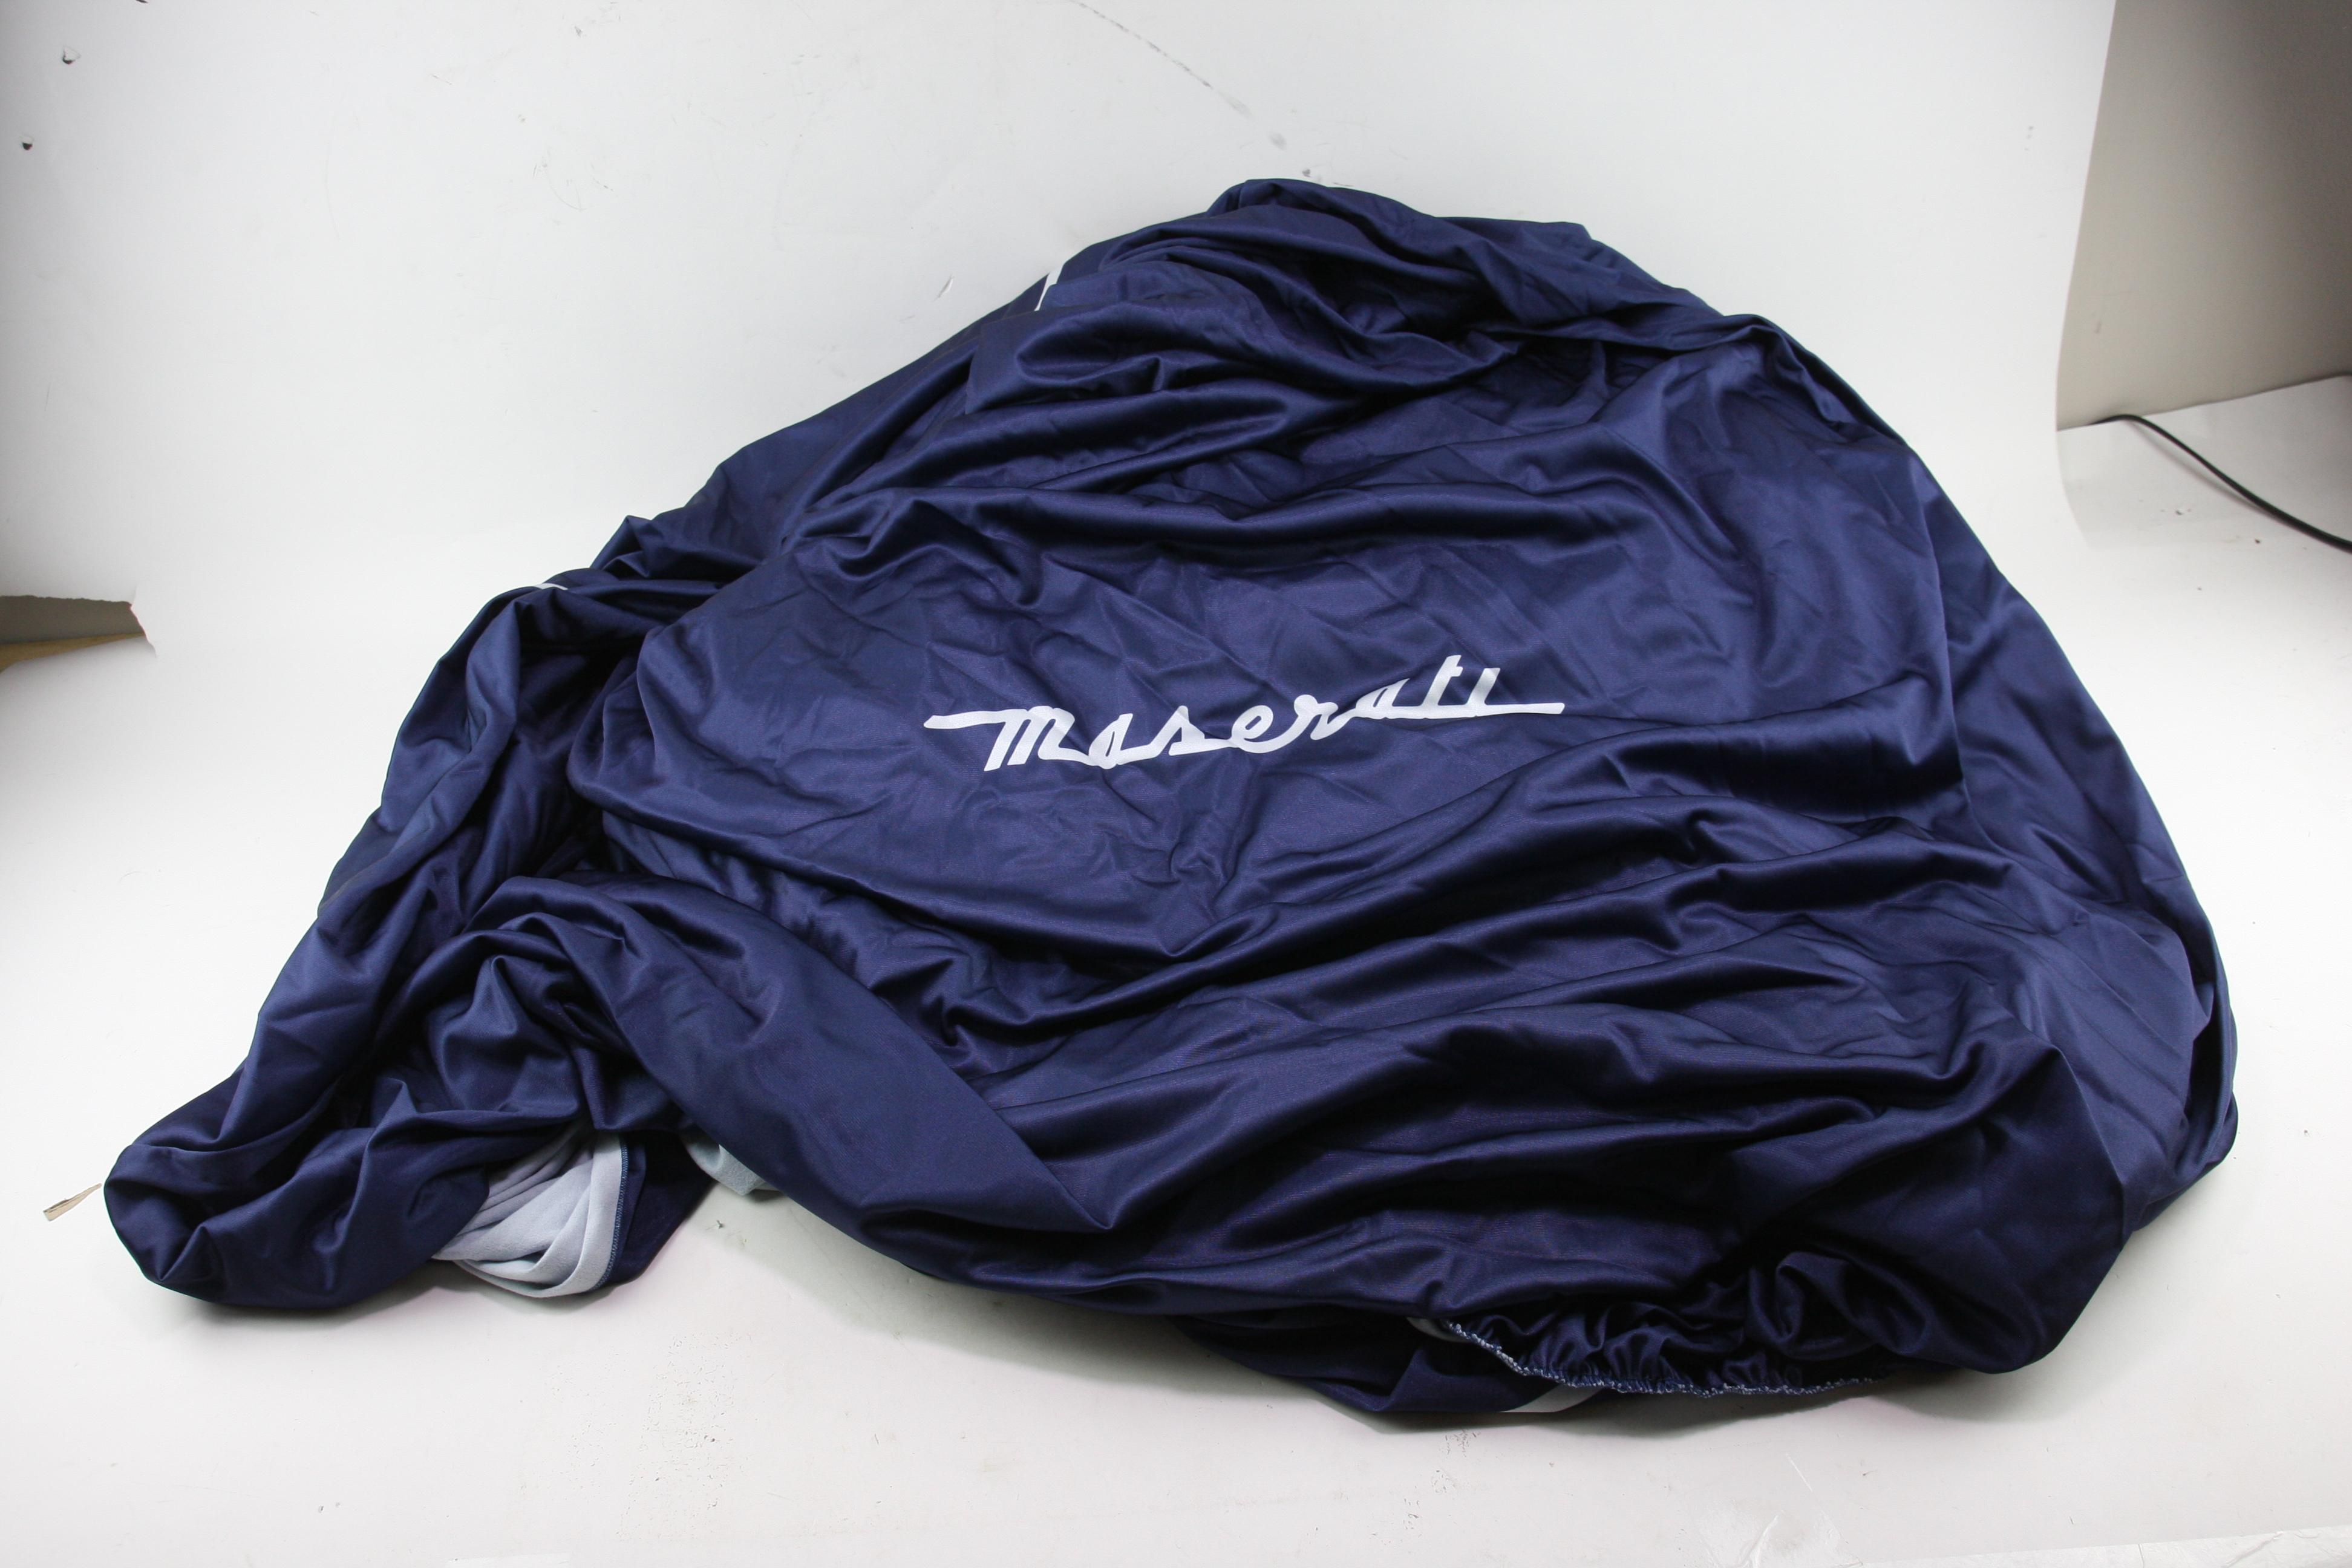 * New OEM 940000573 Genuine Maserati Levante Indoor Car Cover Free US Shipping - image 5